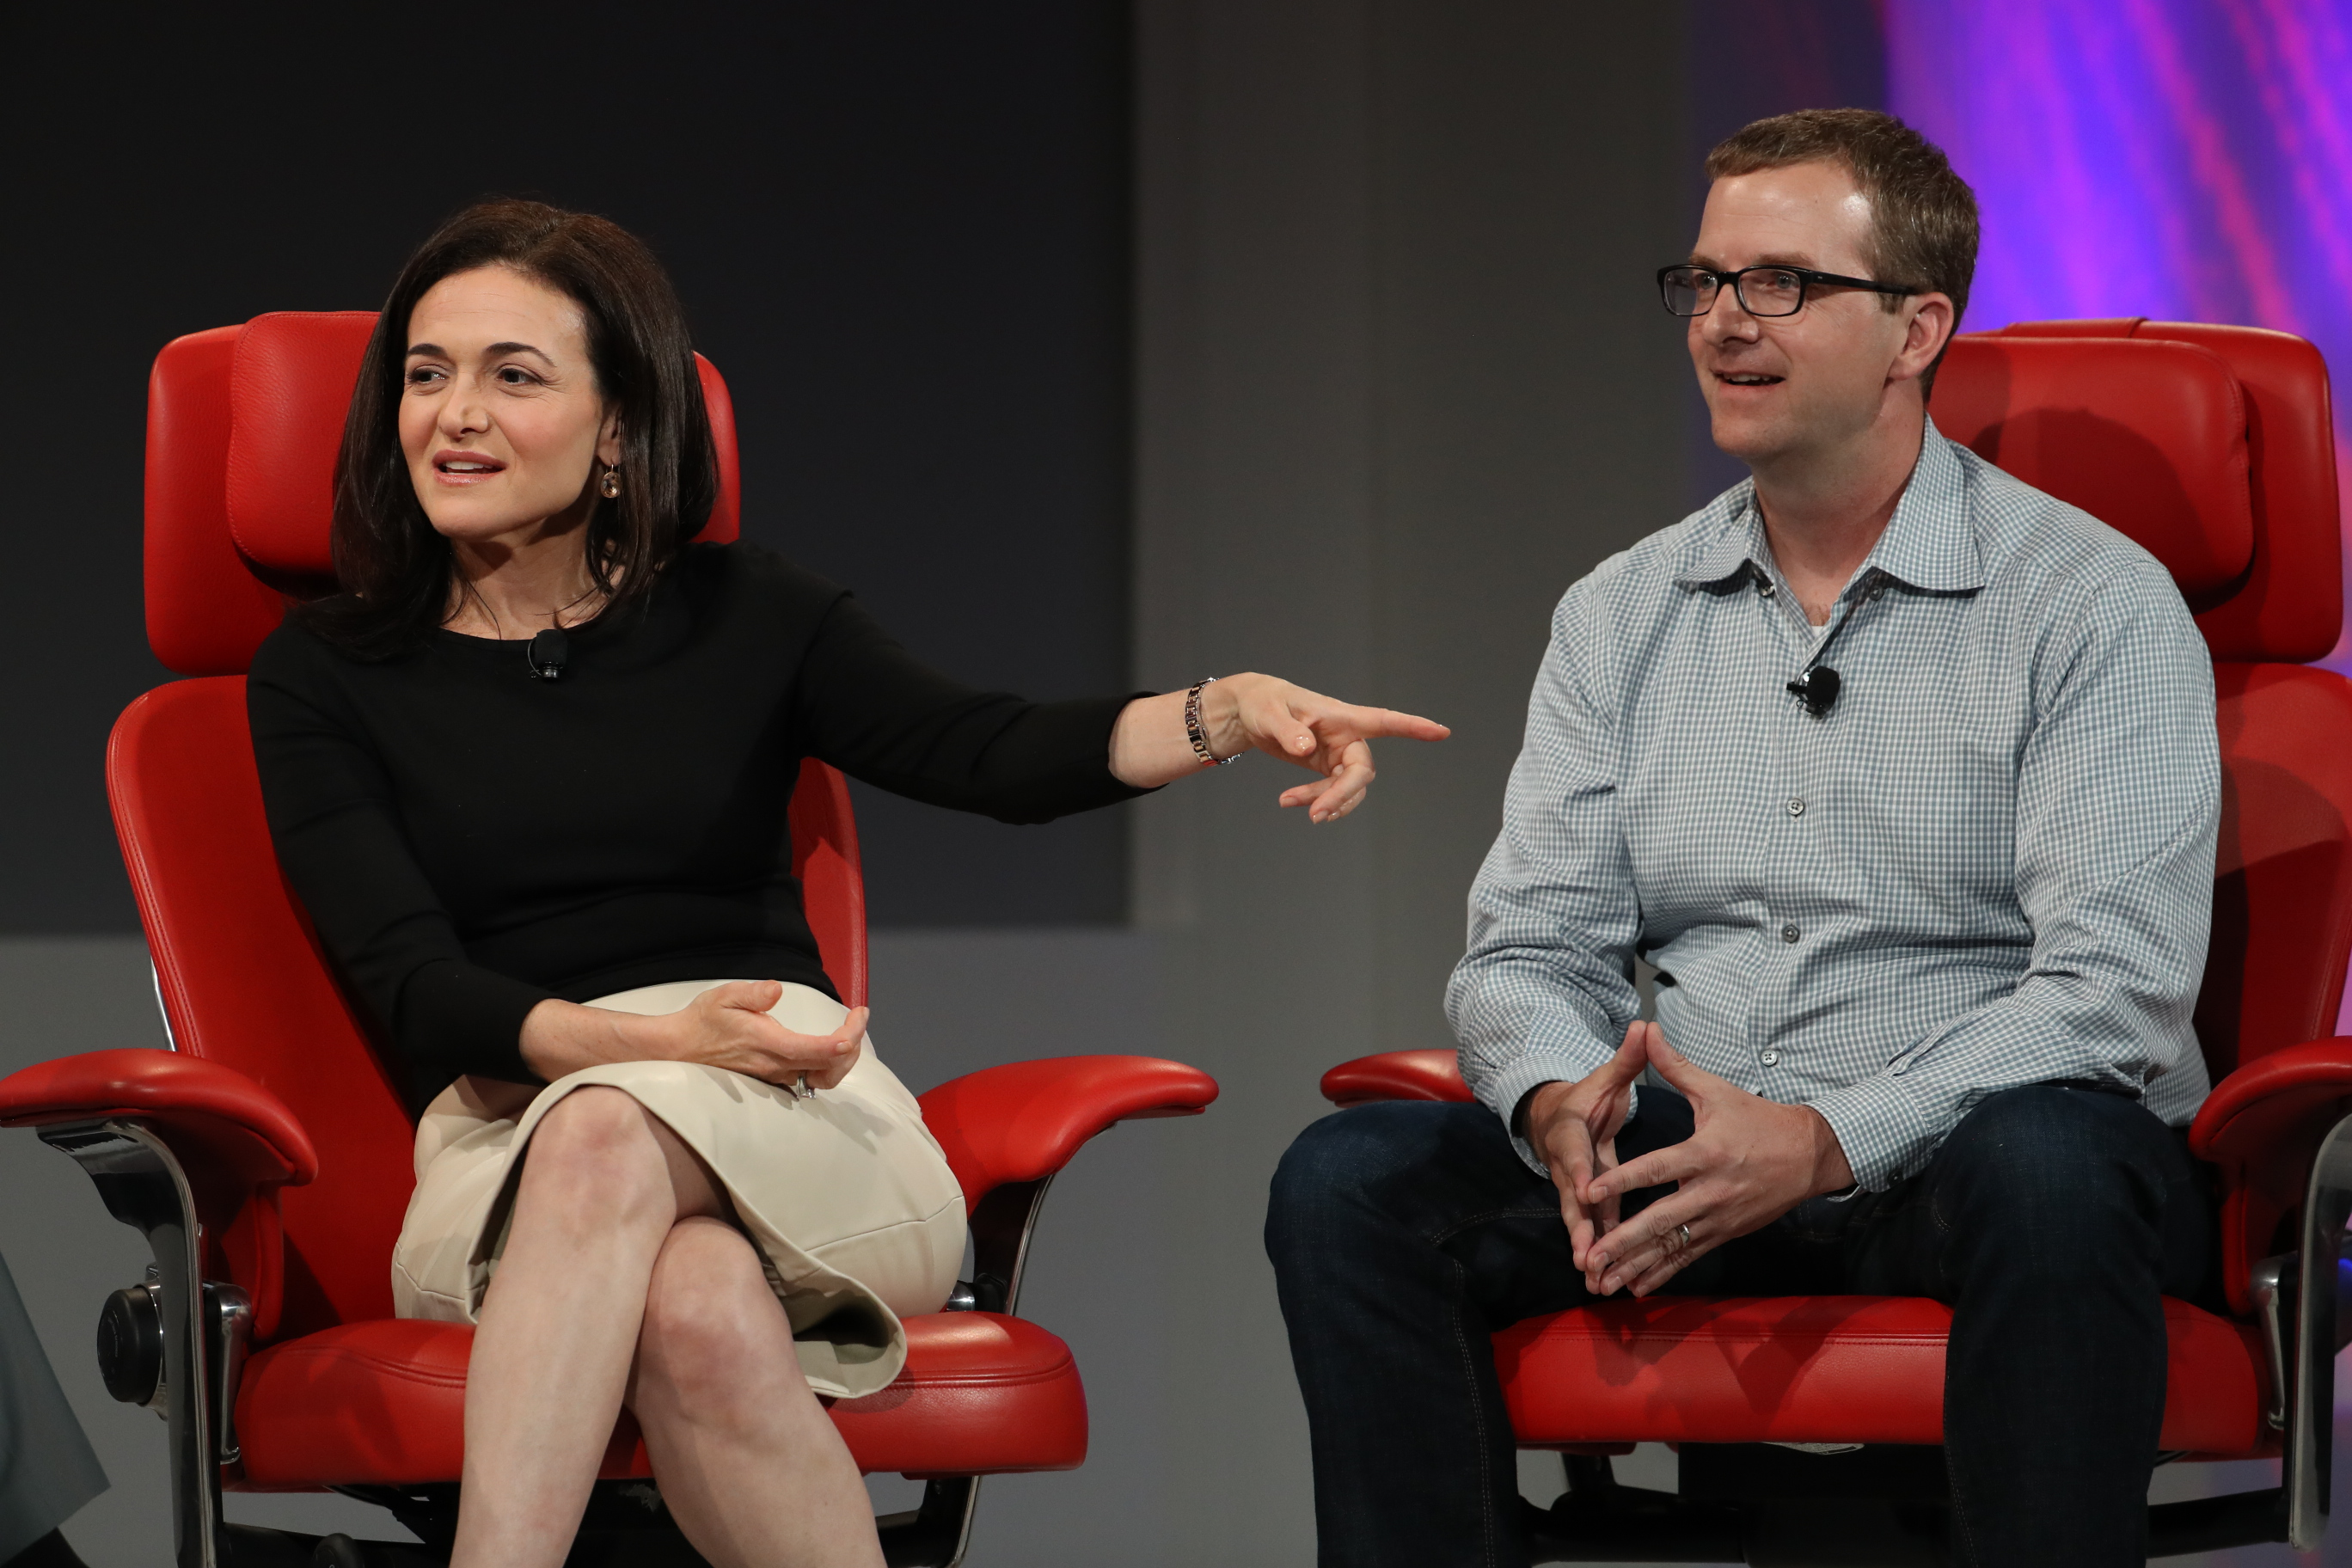 Facebook COO Sheryl Sandberg and CTO Mike Schroepfer